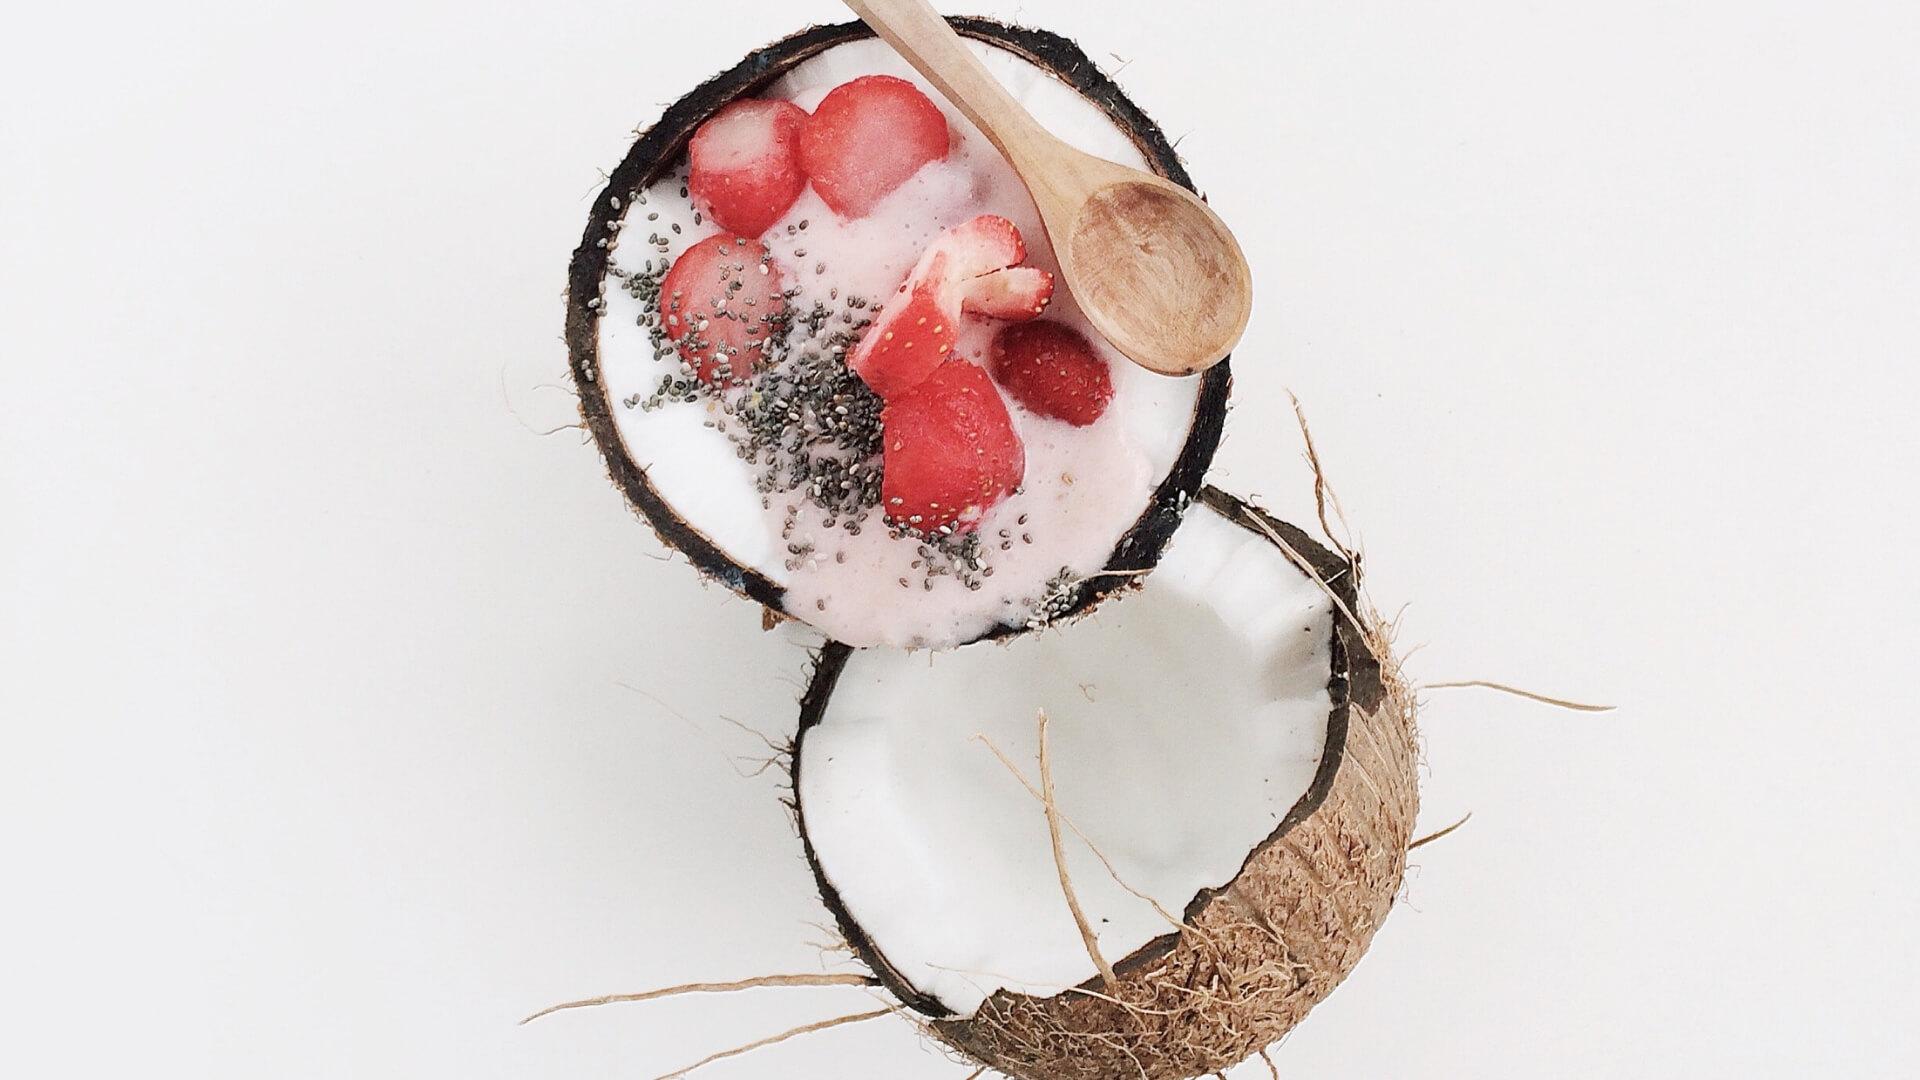 Strawberries & Coconut Cream